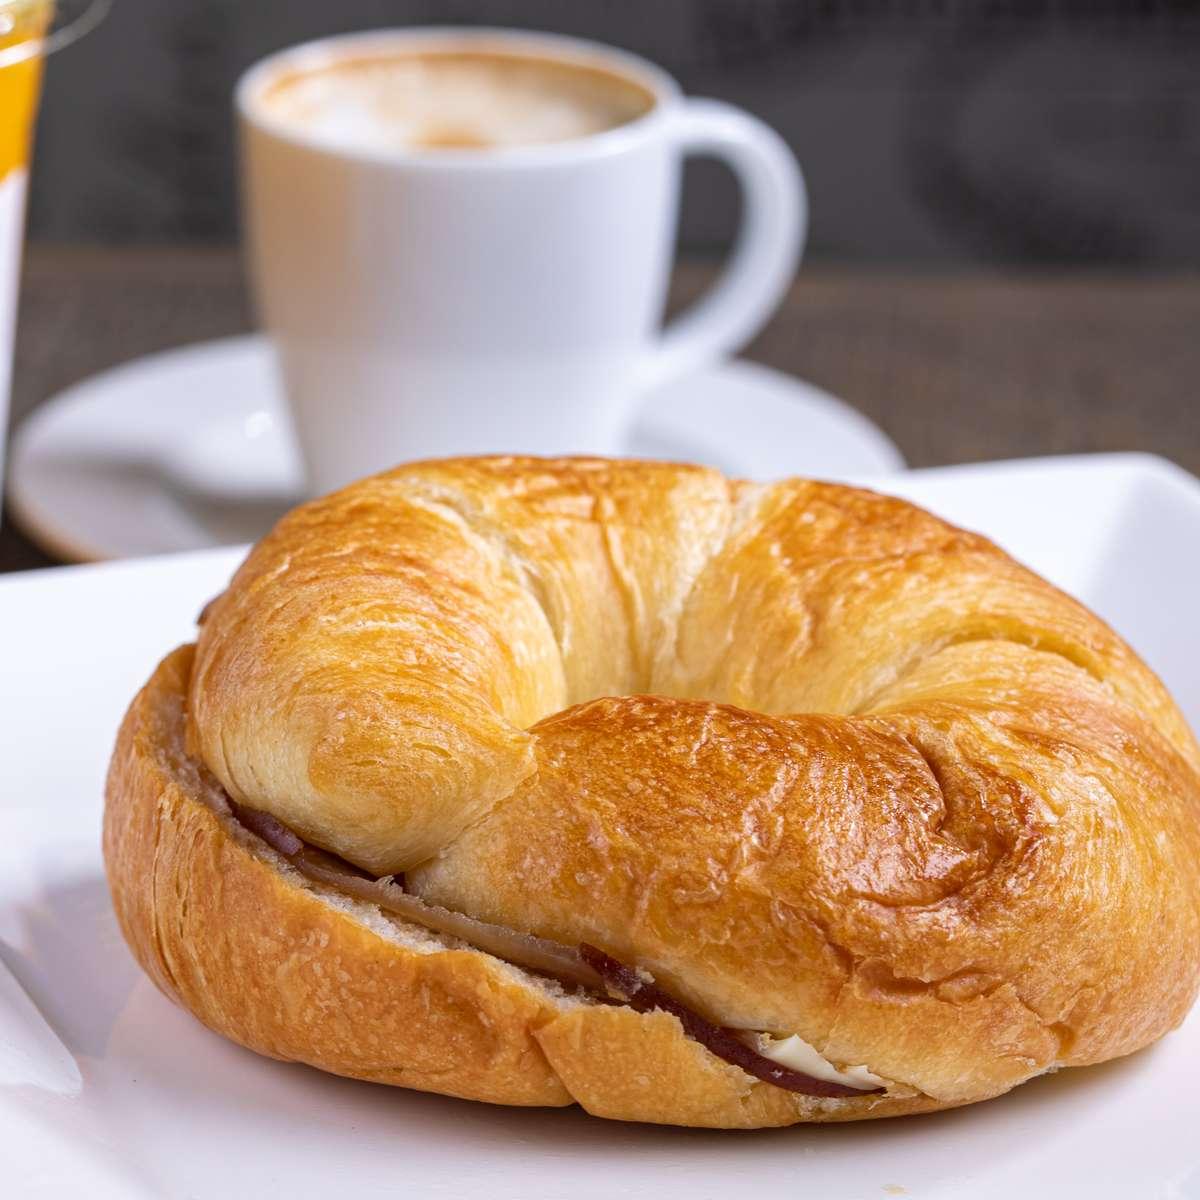 #2 French Breakfast